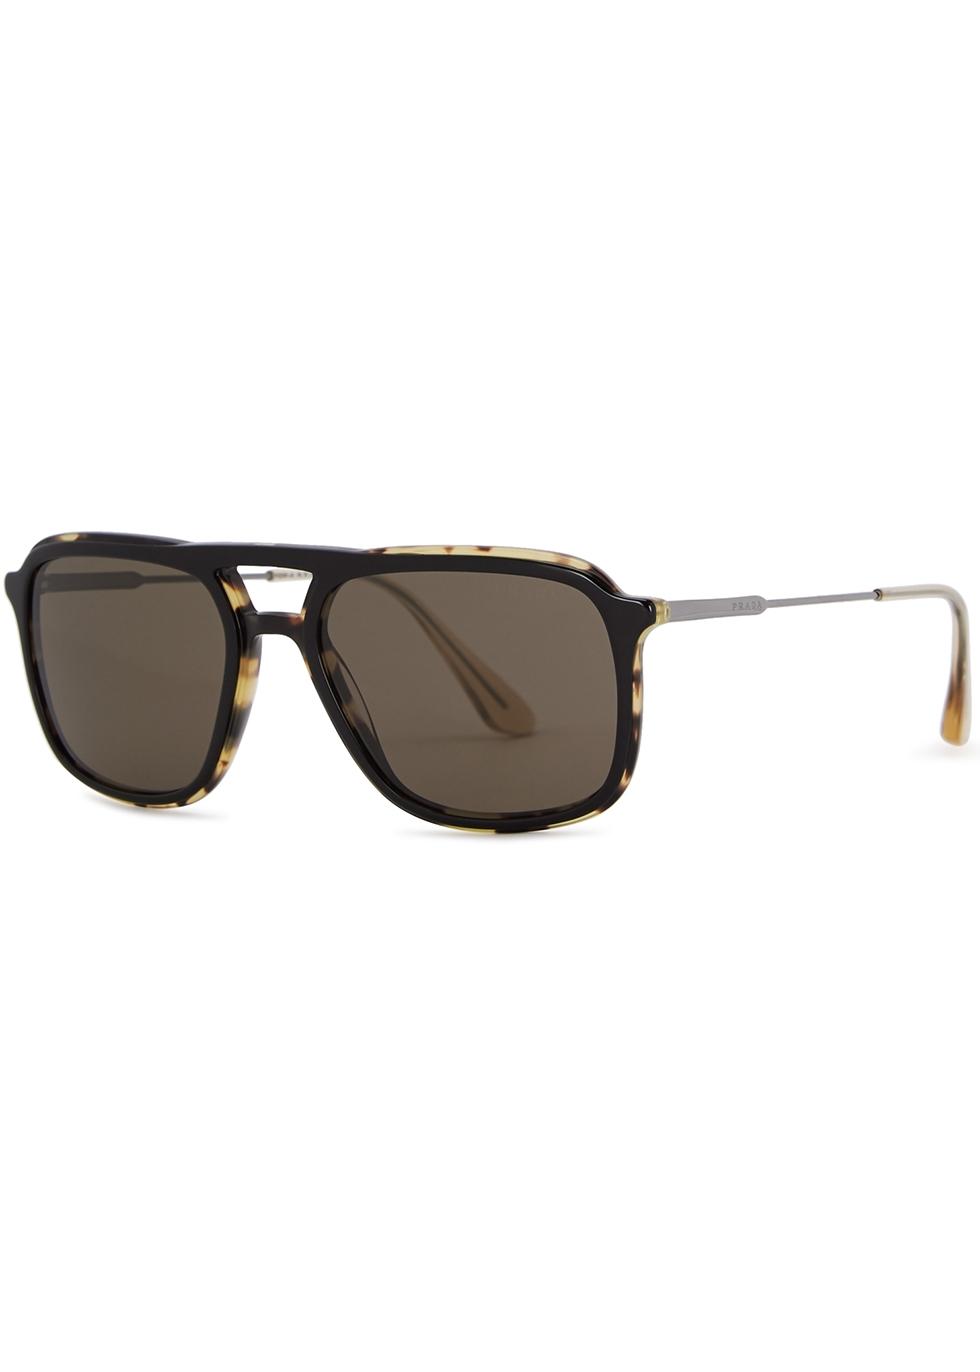 40a2c44ca733 Women s Designer Sunglasses and Eyewear - Harvey Nichols